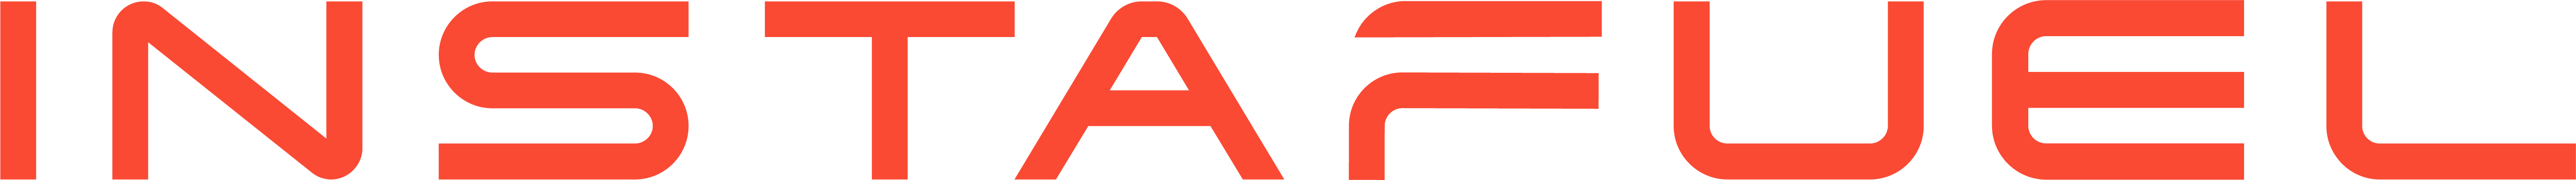 fleet fueling instafuel logo